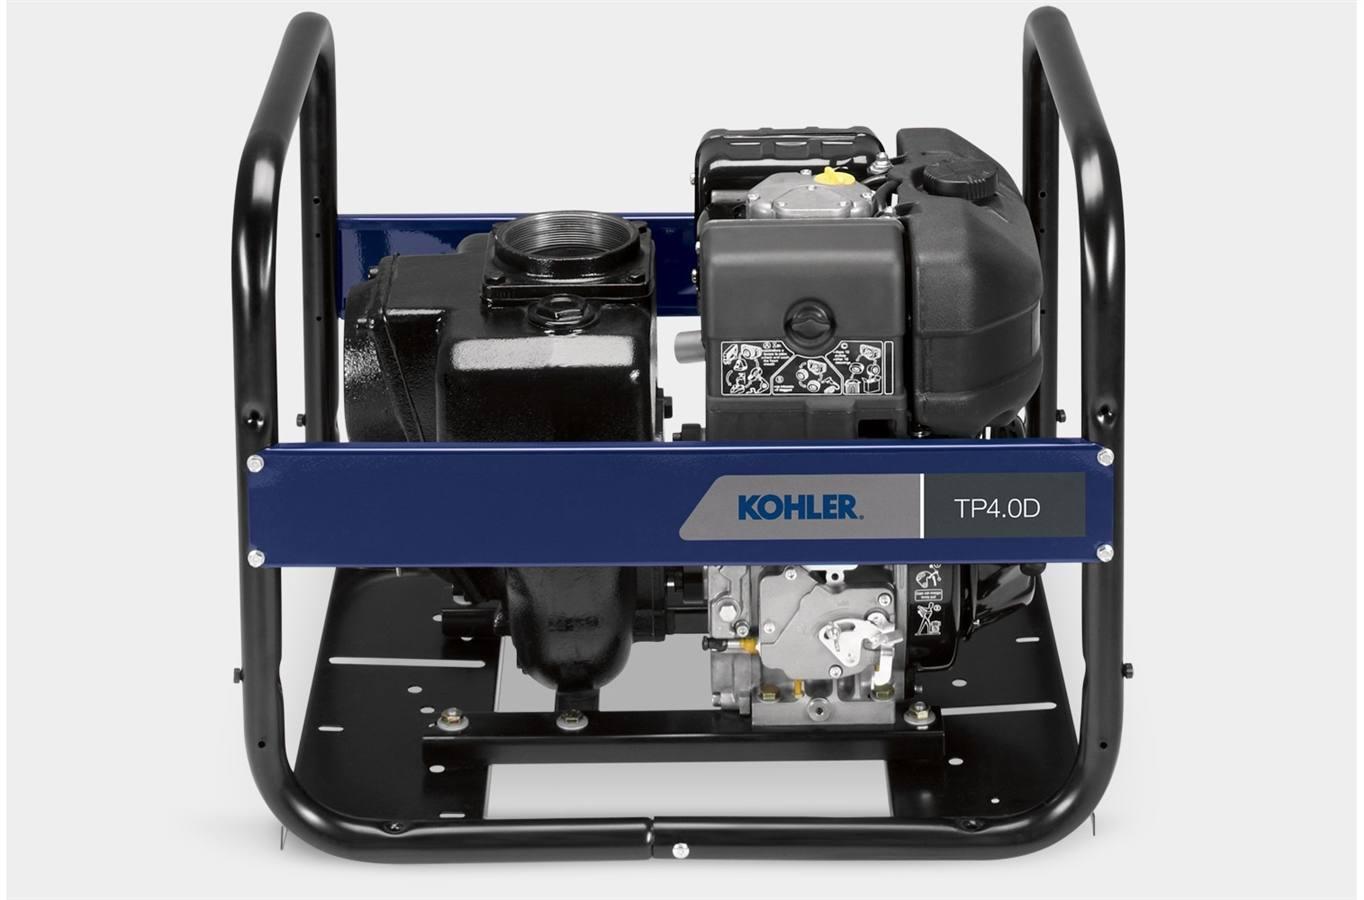 2019 Kohler Engine TP4 0D